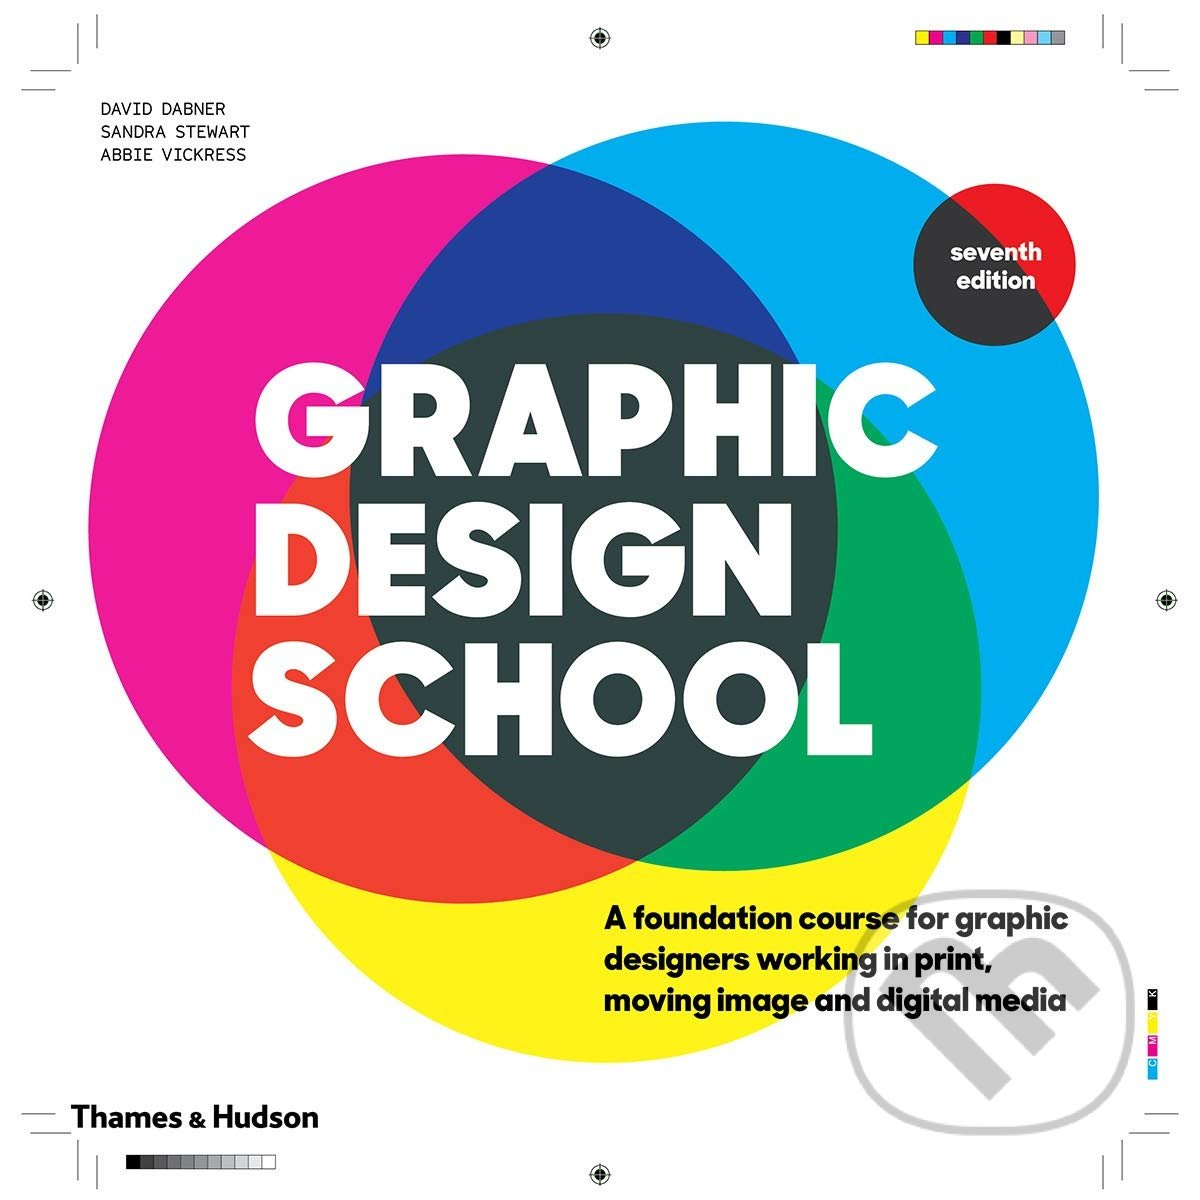 Graphic Design School - David Dabner, Sandra Stewart, Abbie Vickress